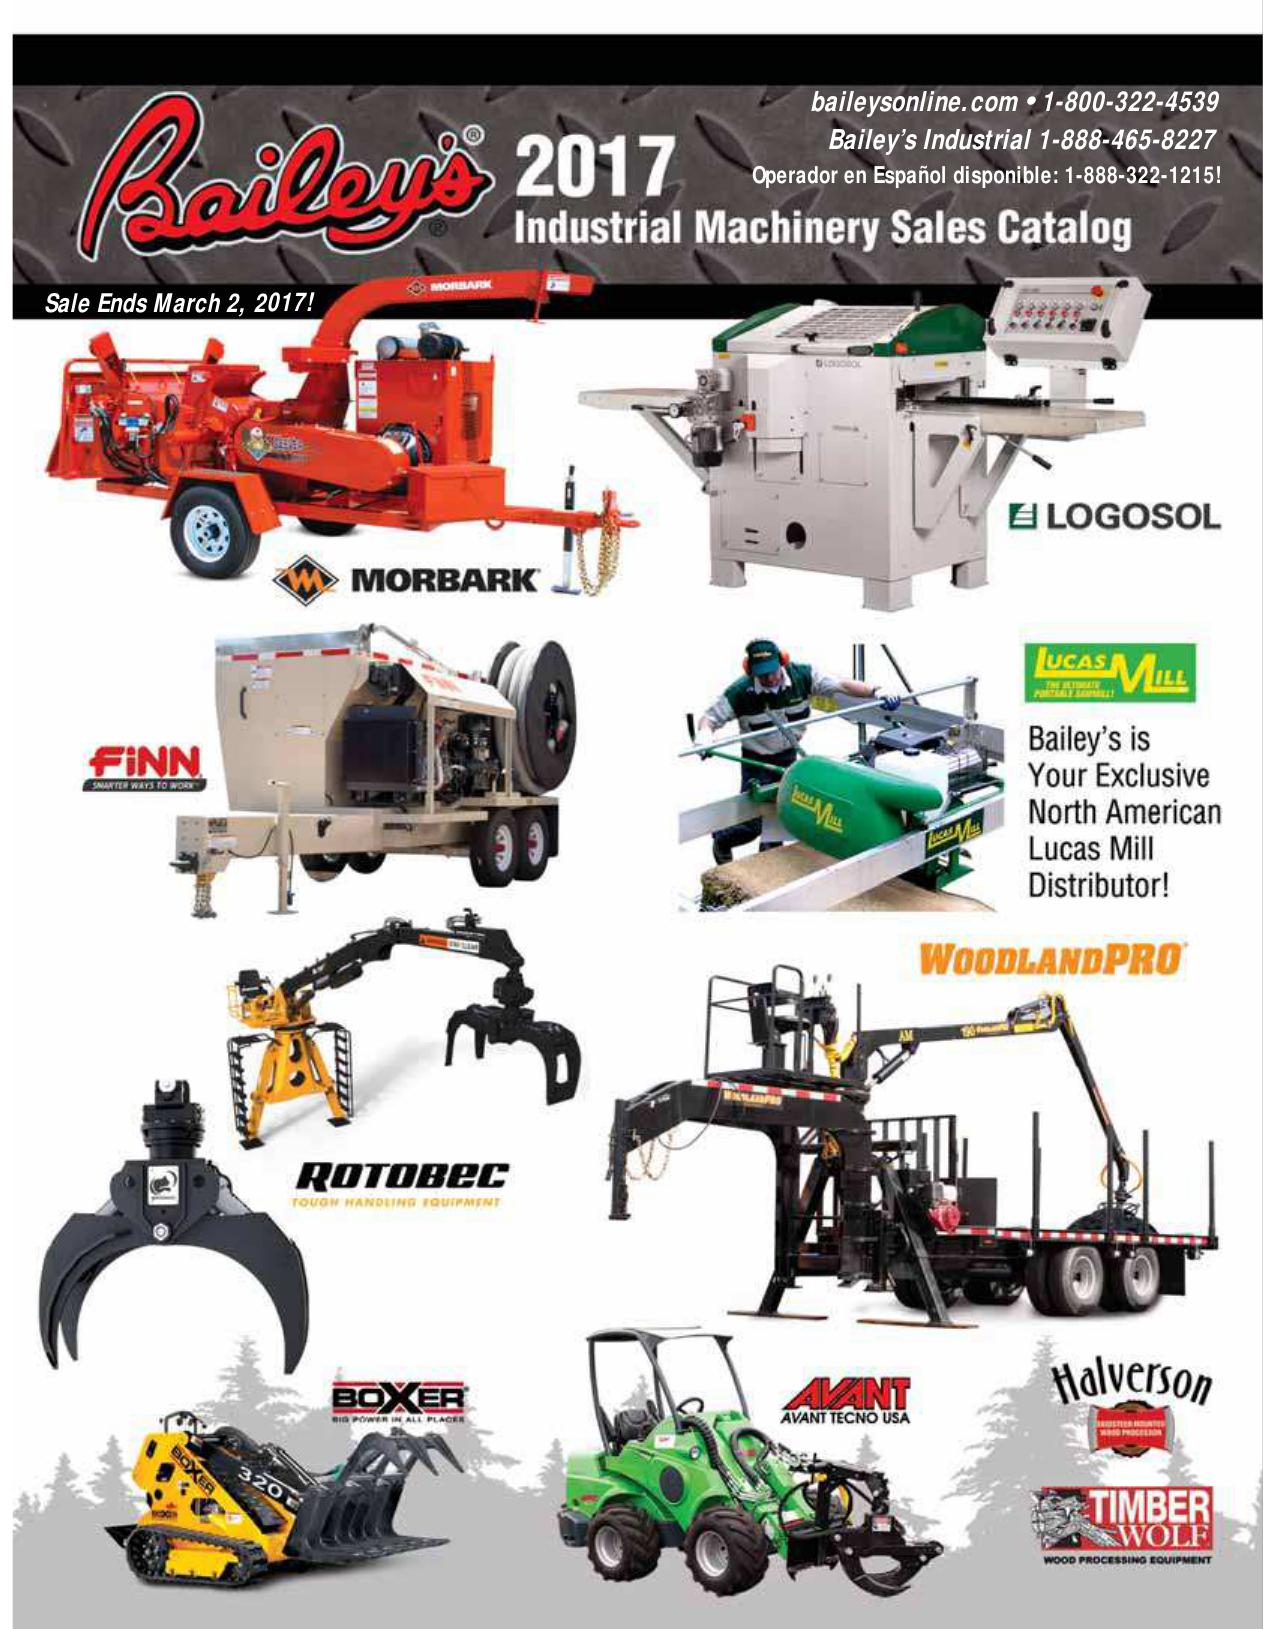 baileysonline com • 1-800-322-4539 Bailey`s Industrial 1-888